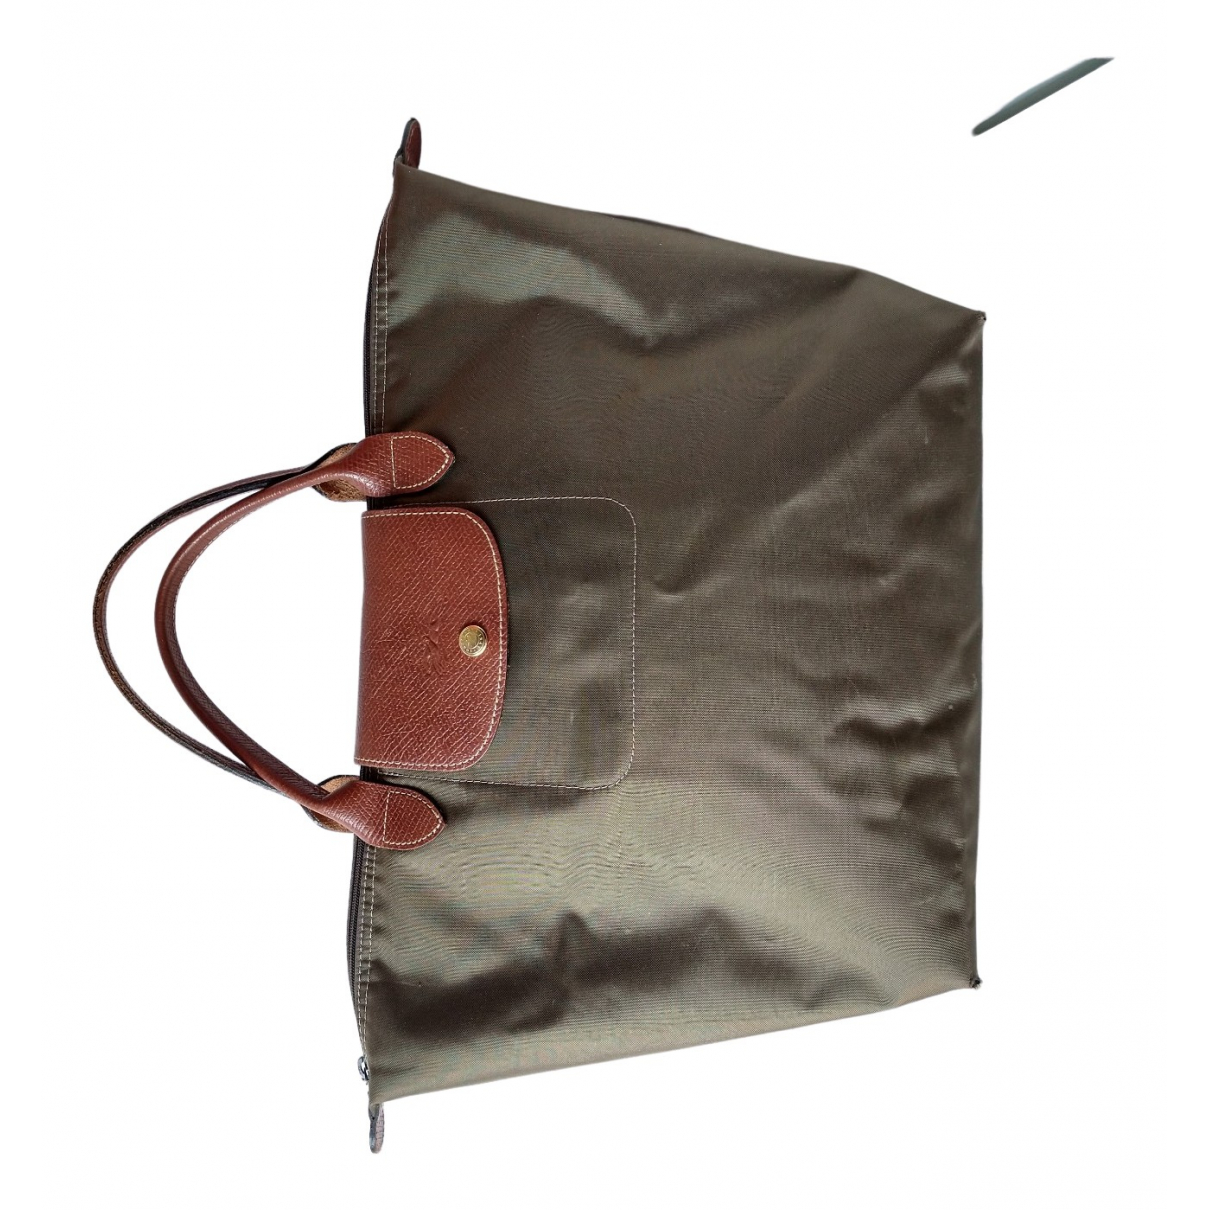 Longchamp Pliage  Handtasche in  Khaki Synthetik